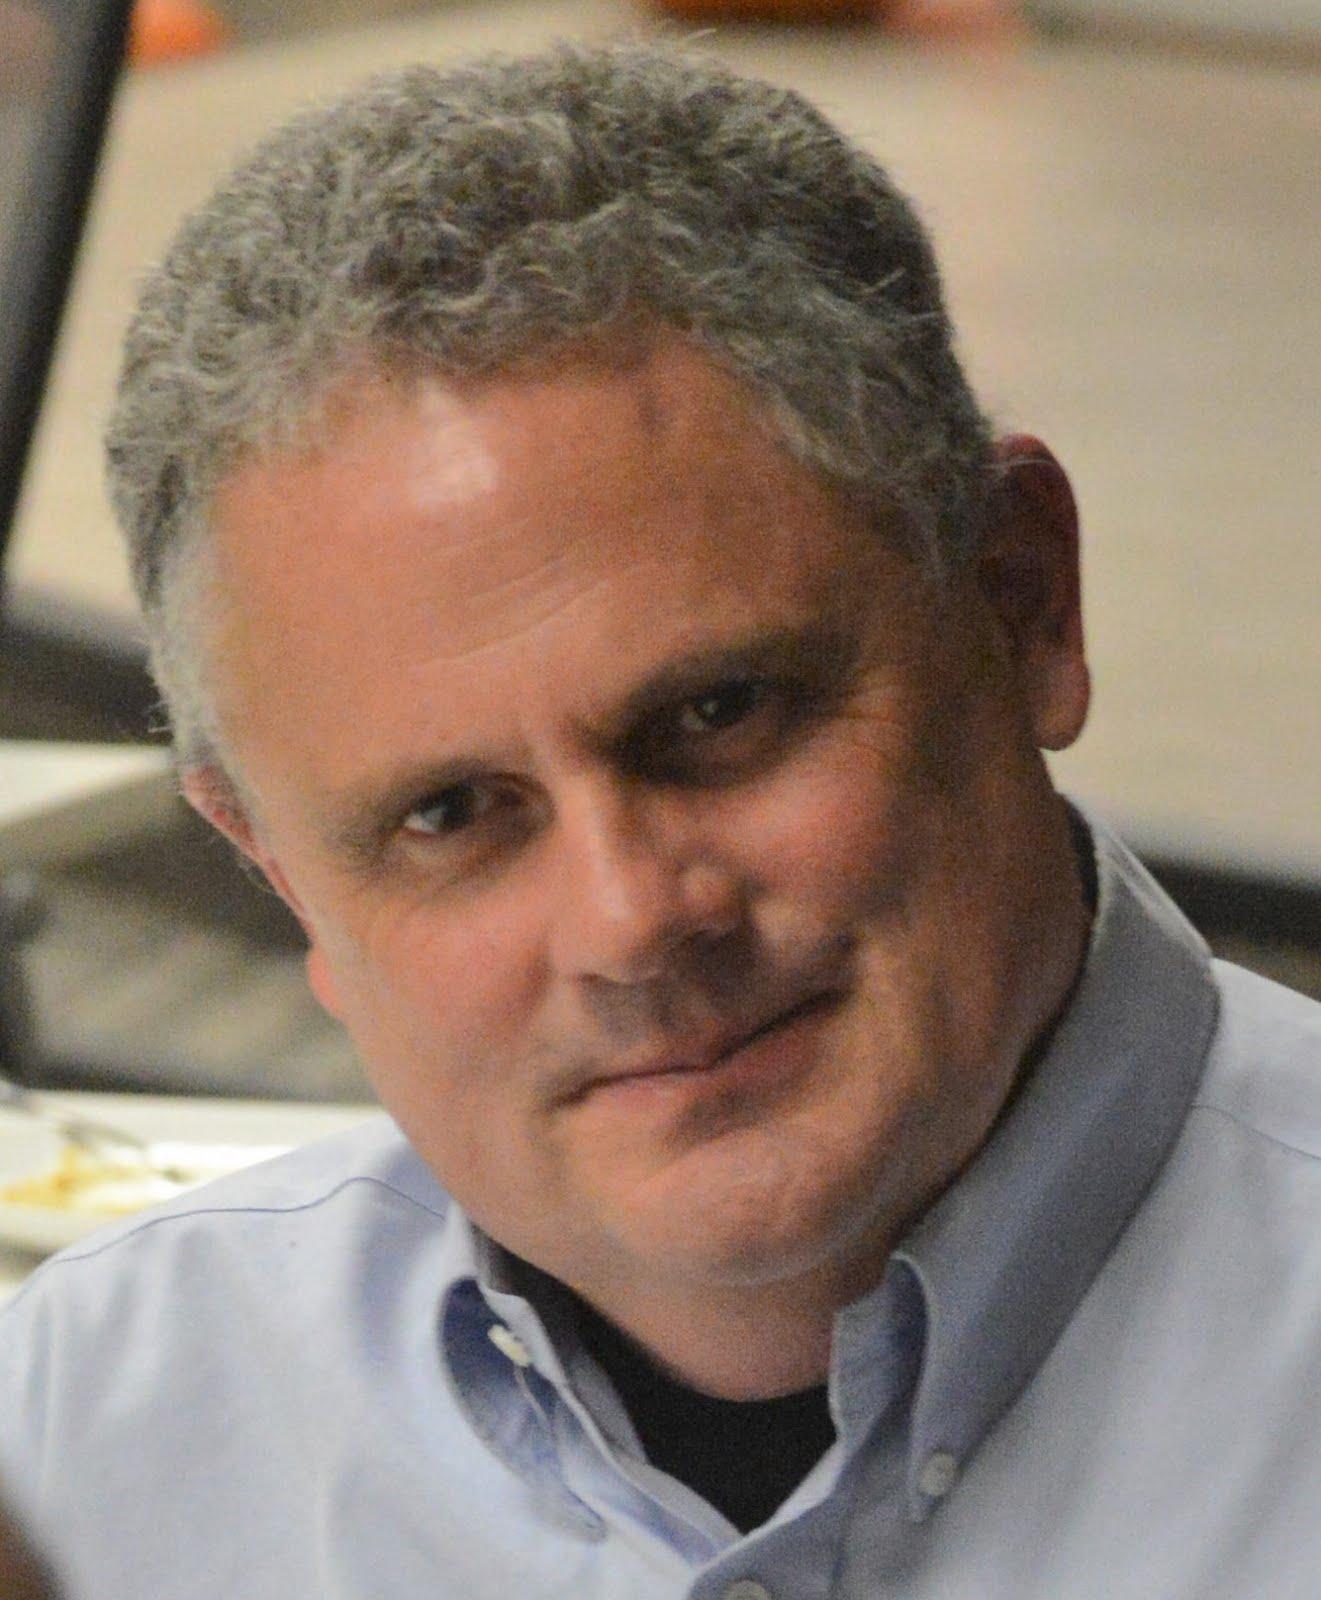 Phil Reitinger